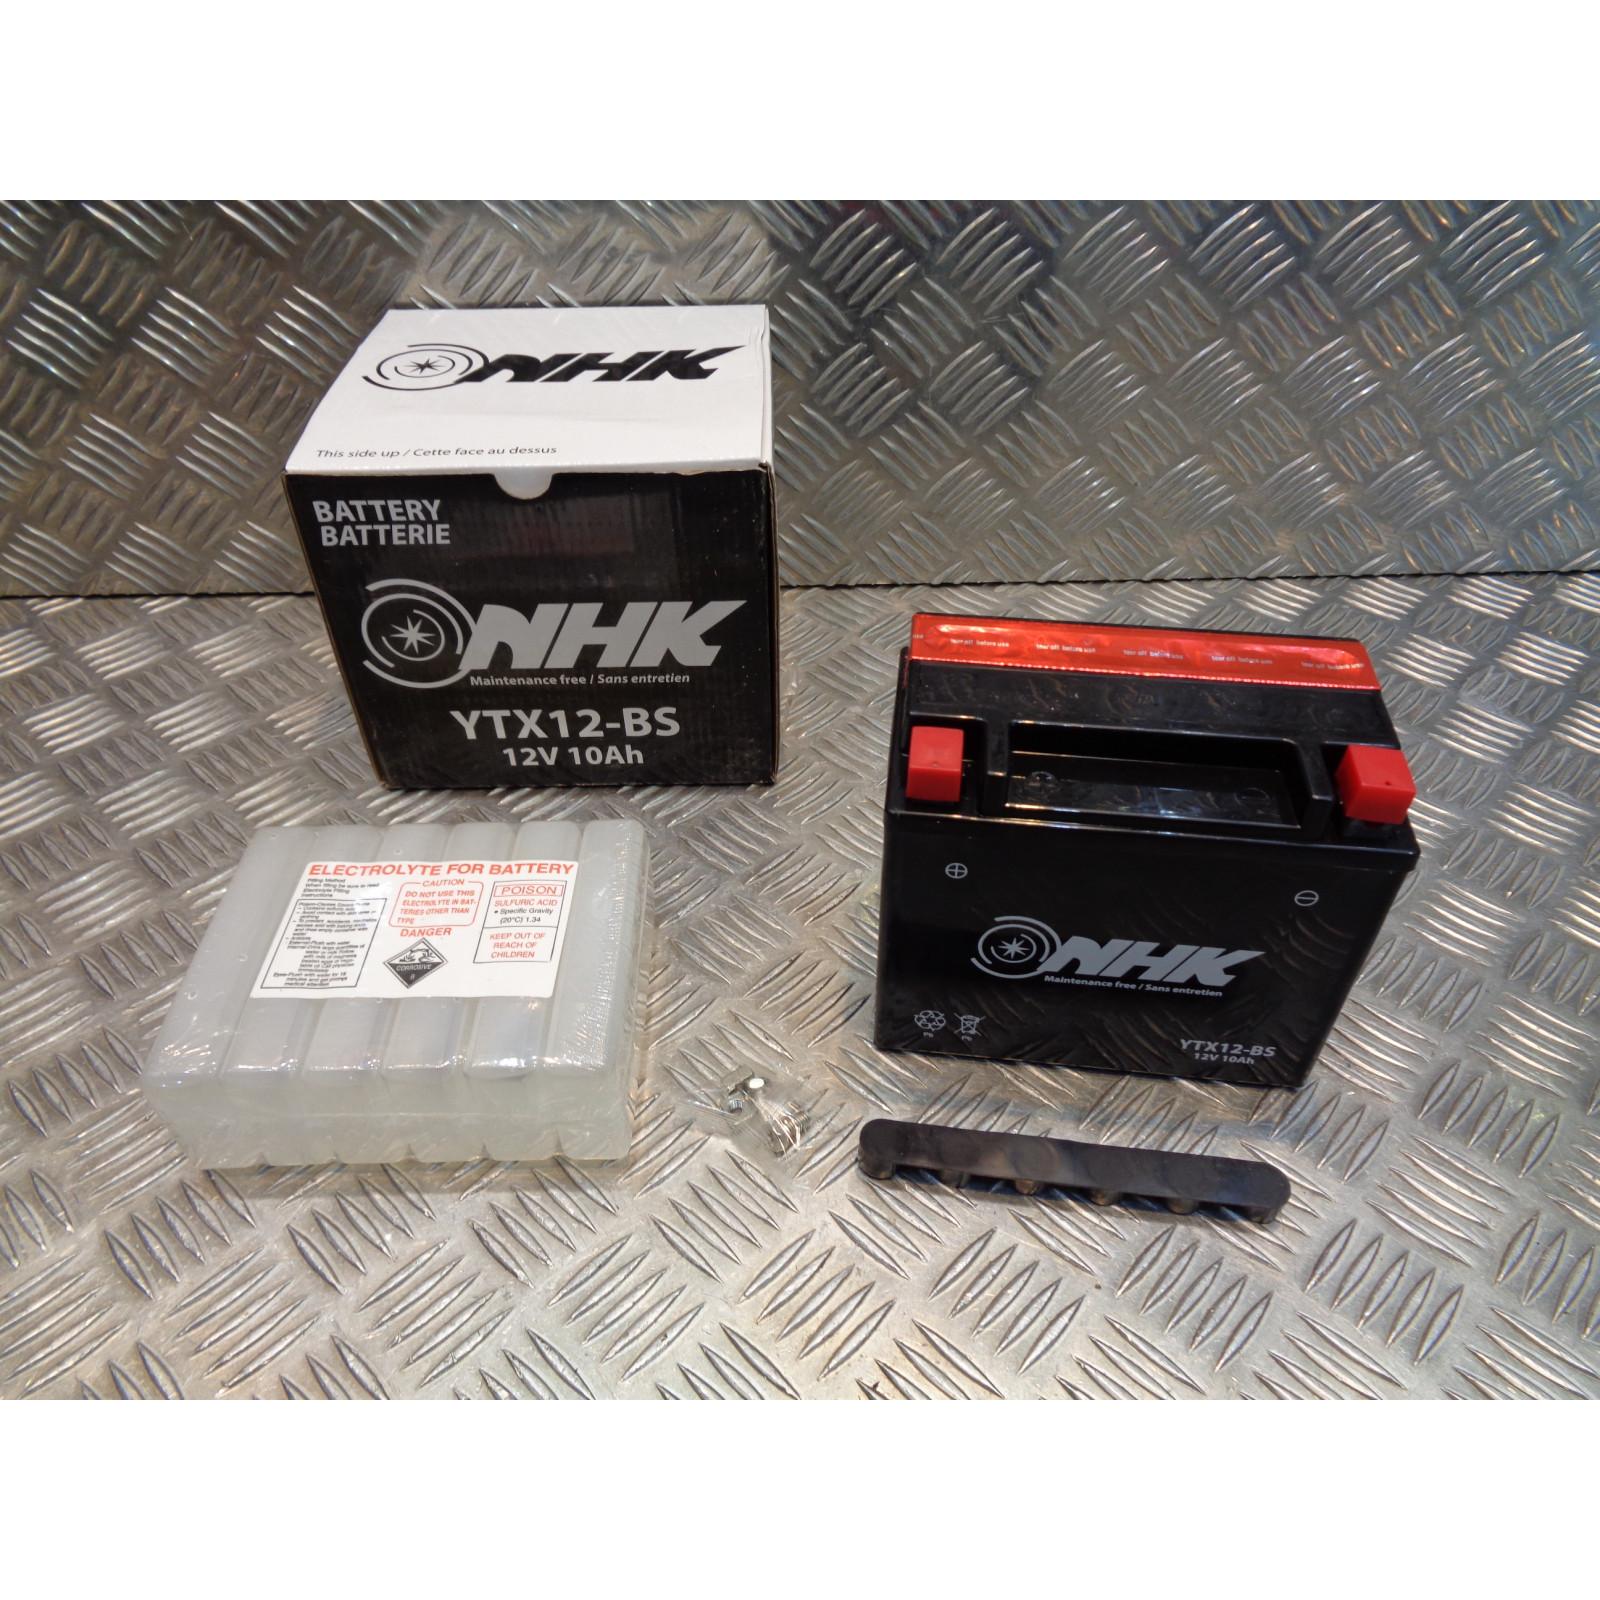 batterie 12v - 10Ah nhk ytx12-bs (Lg151xL87xH131) livree avec pack acide moto scooter quad ...